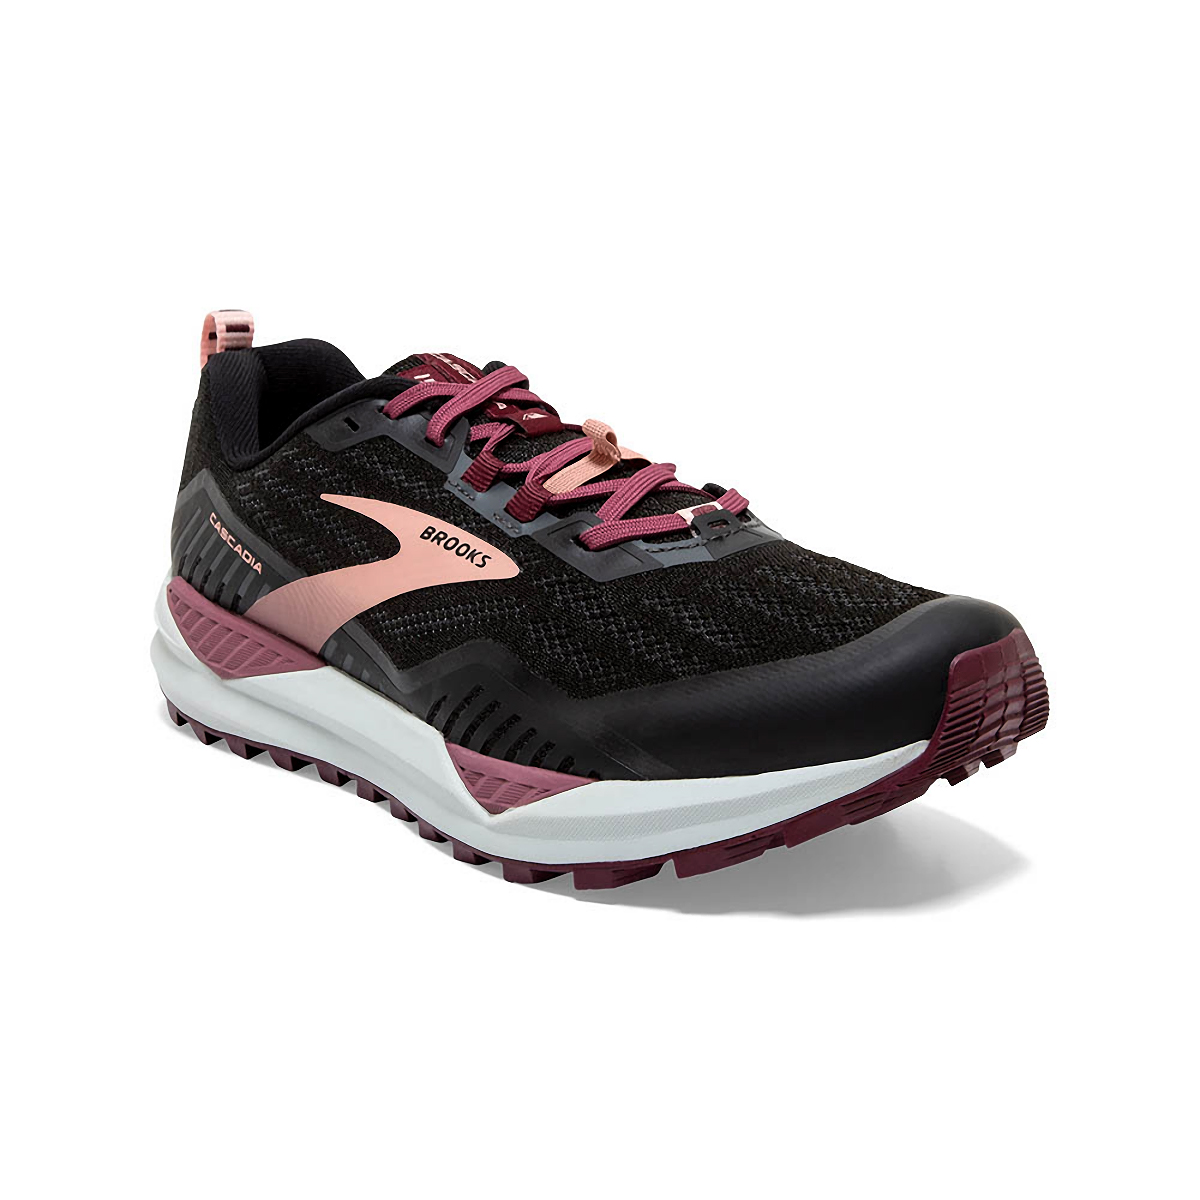 Women's Brooks Cascadia 15 Trail Running Shoe - Color: Black/Ebony/Coral - Size: 10.5 - Width: Regular, Black/Ebony/Coral, large, image 3